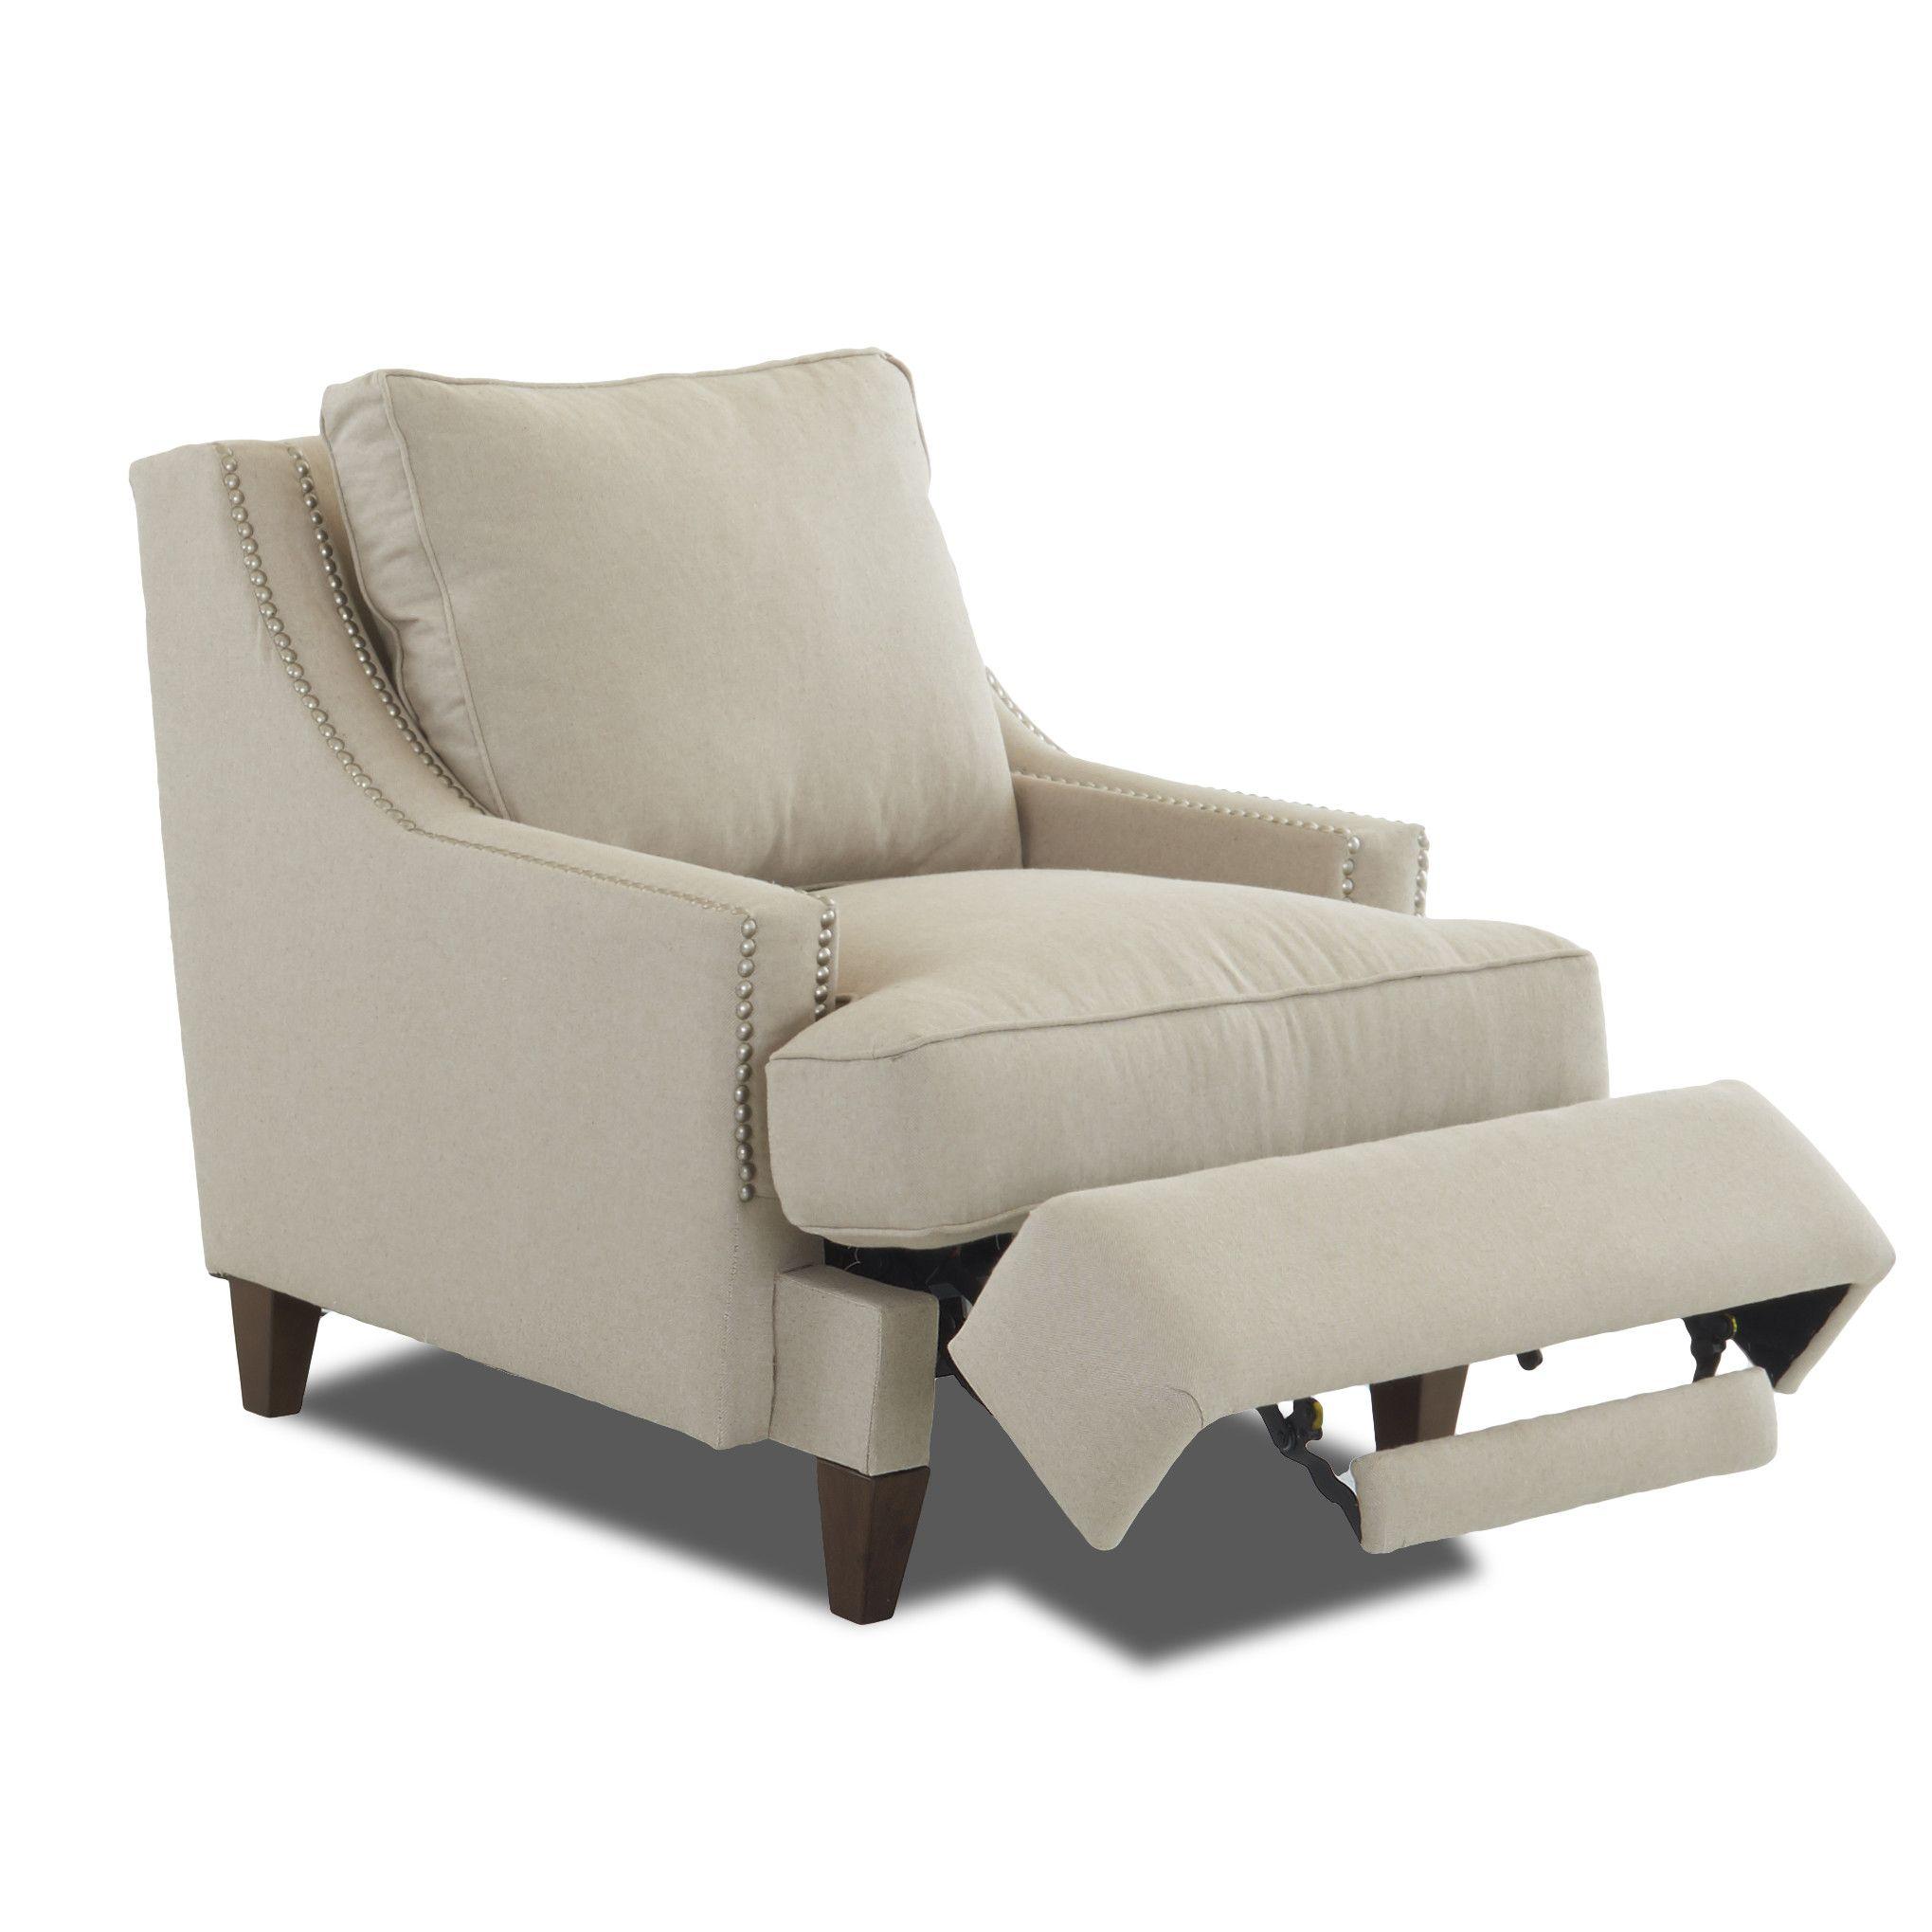 Tricia Power Recliner Modern Recliner Chairs Wayfair Furniture